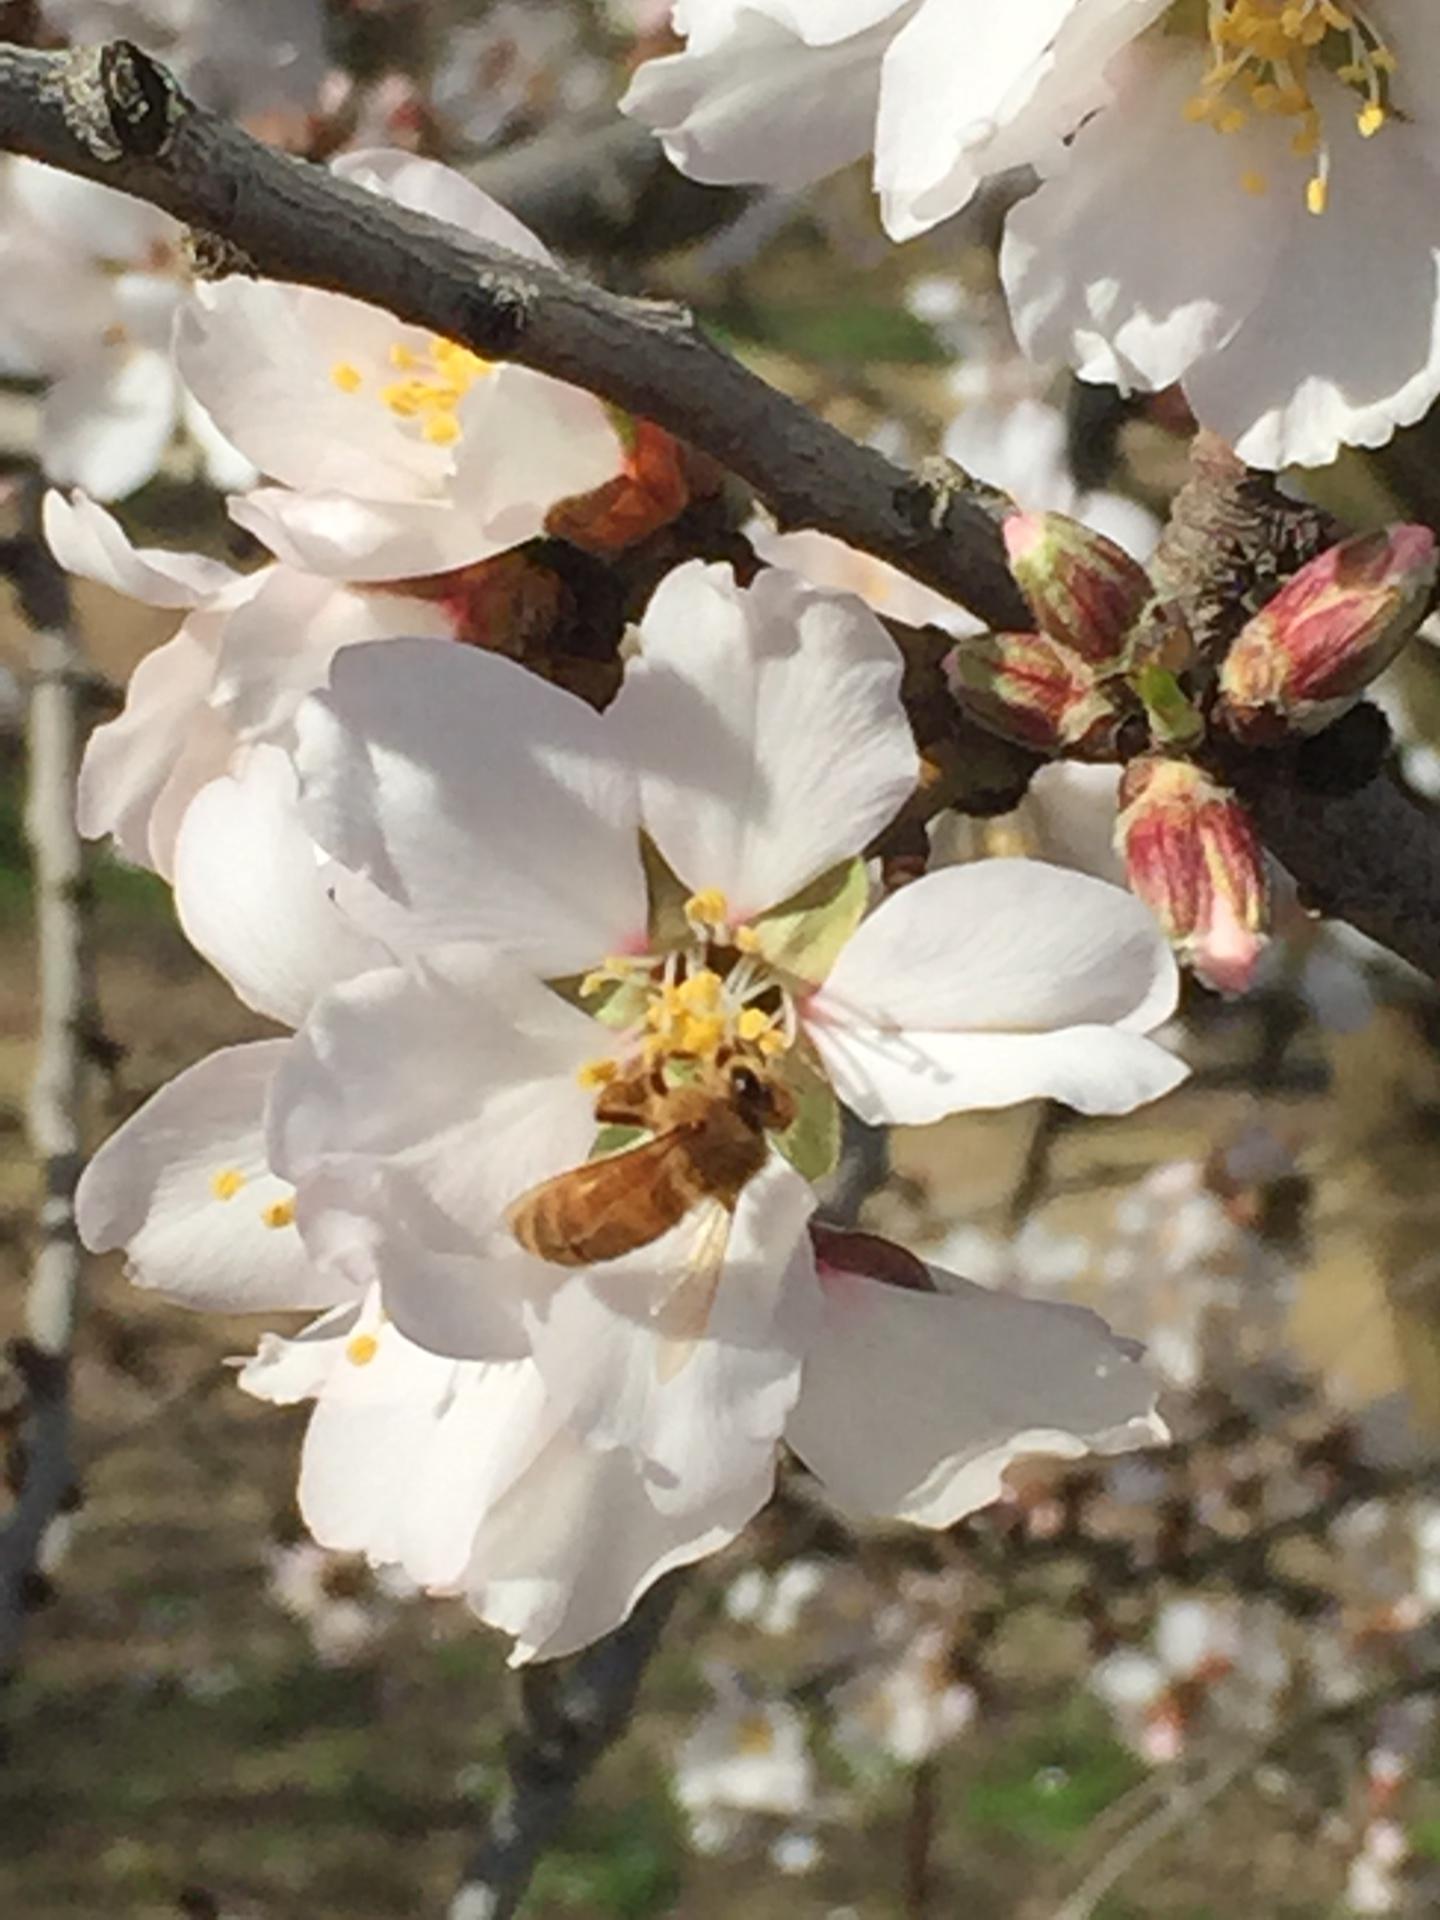 Spring almond bloom